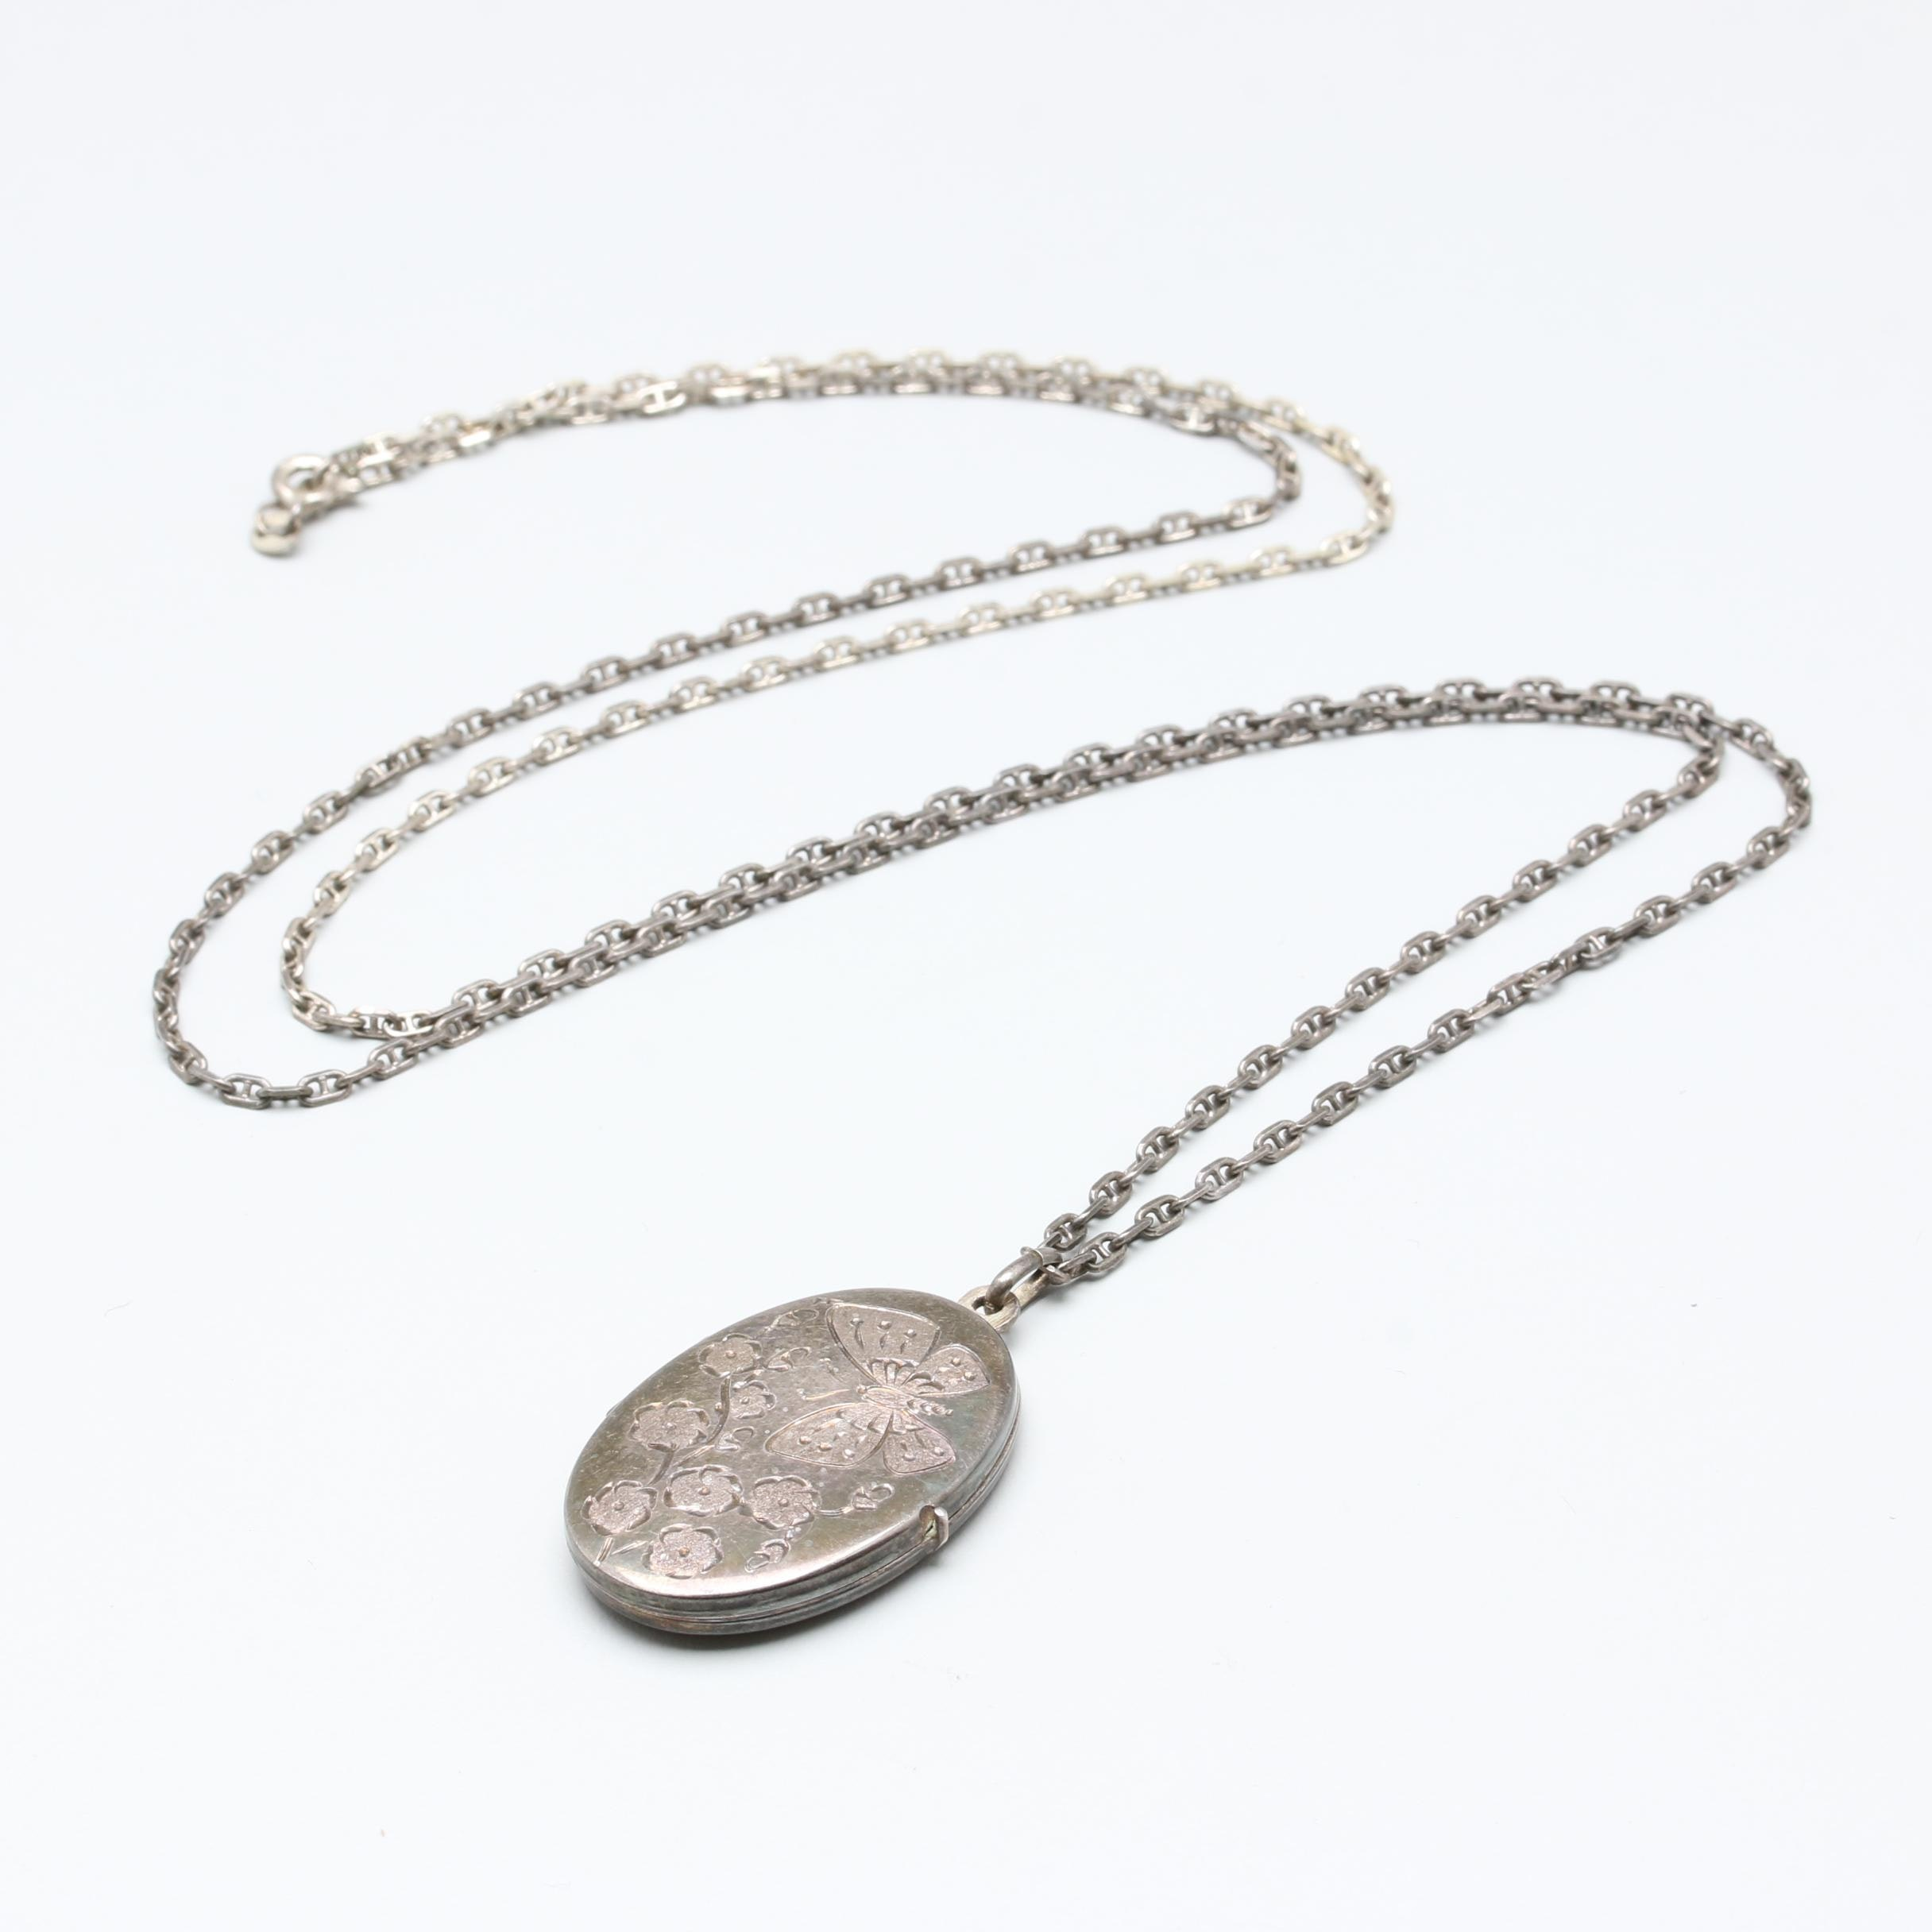 Sterling Silver Locket Pendant Necklace